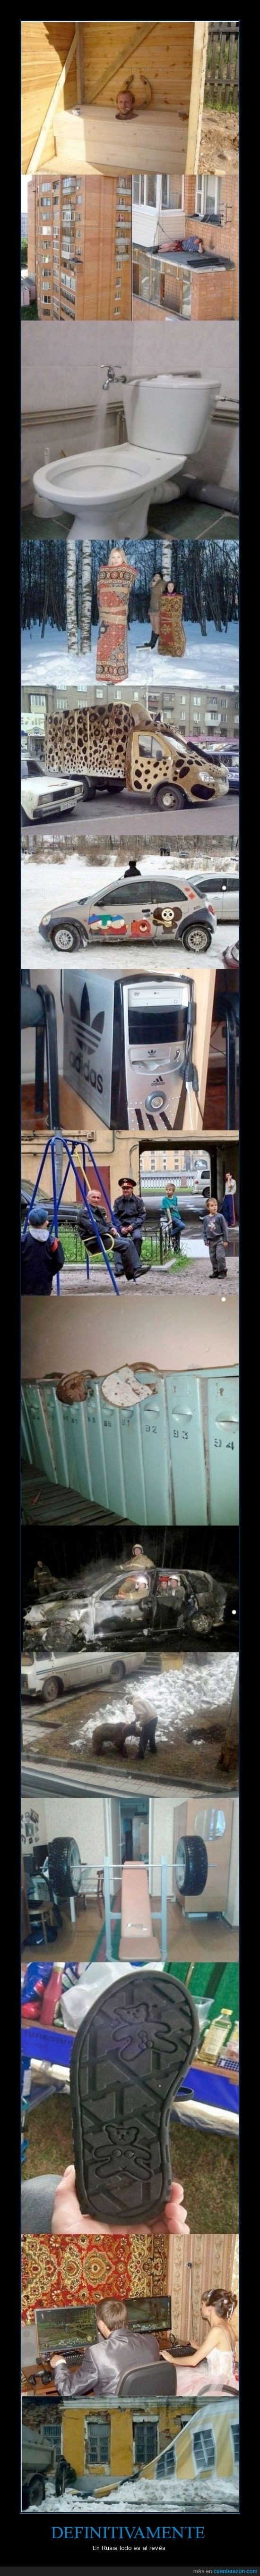 al reves,ex union sovietica,locura,mientrastanto,raro,Rusia